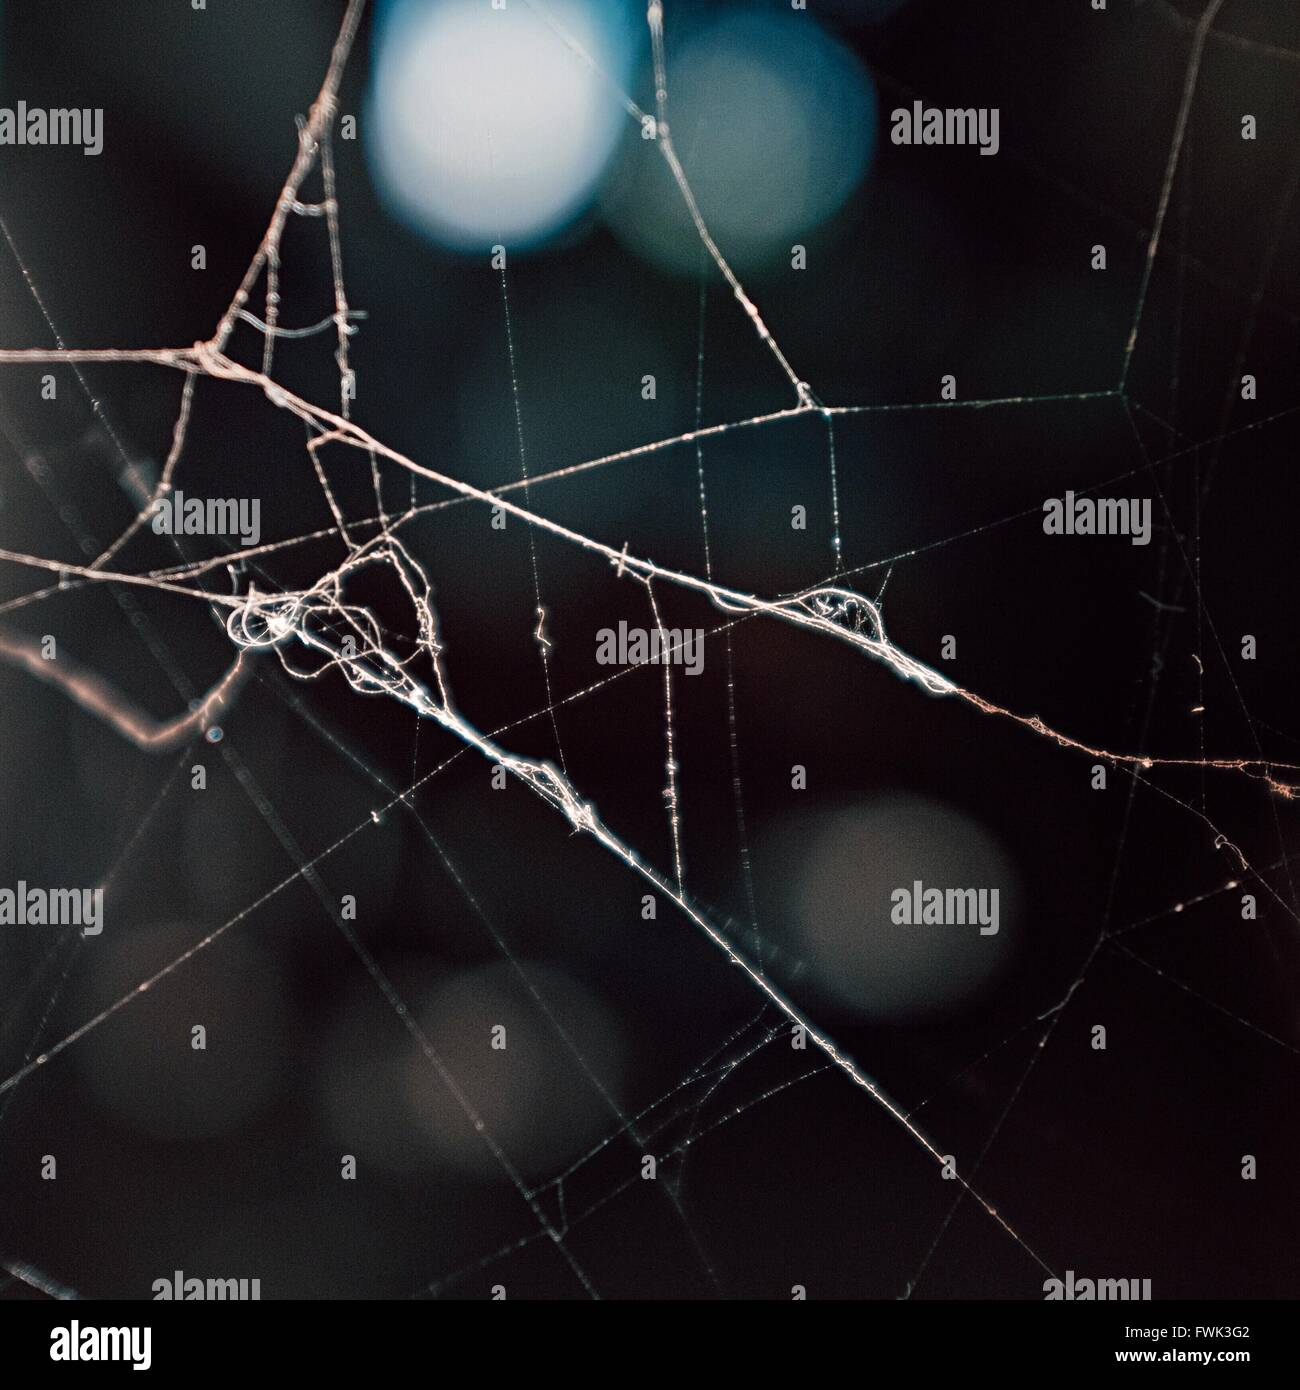 Close-Up Of Cobweb Against Blurred Background - Stock Image